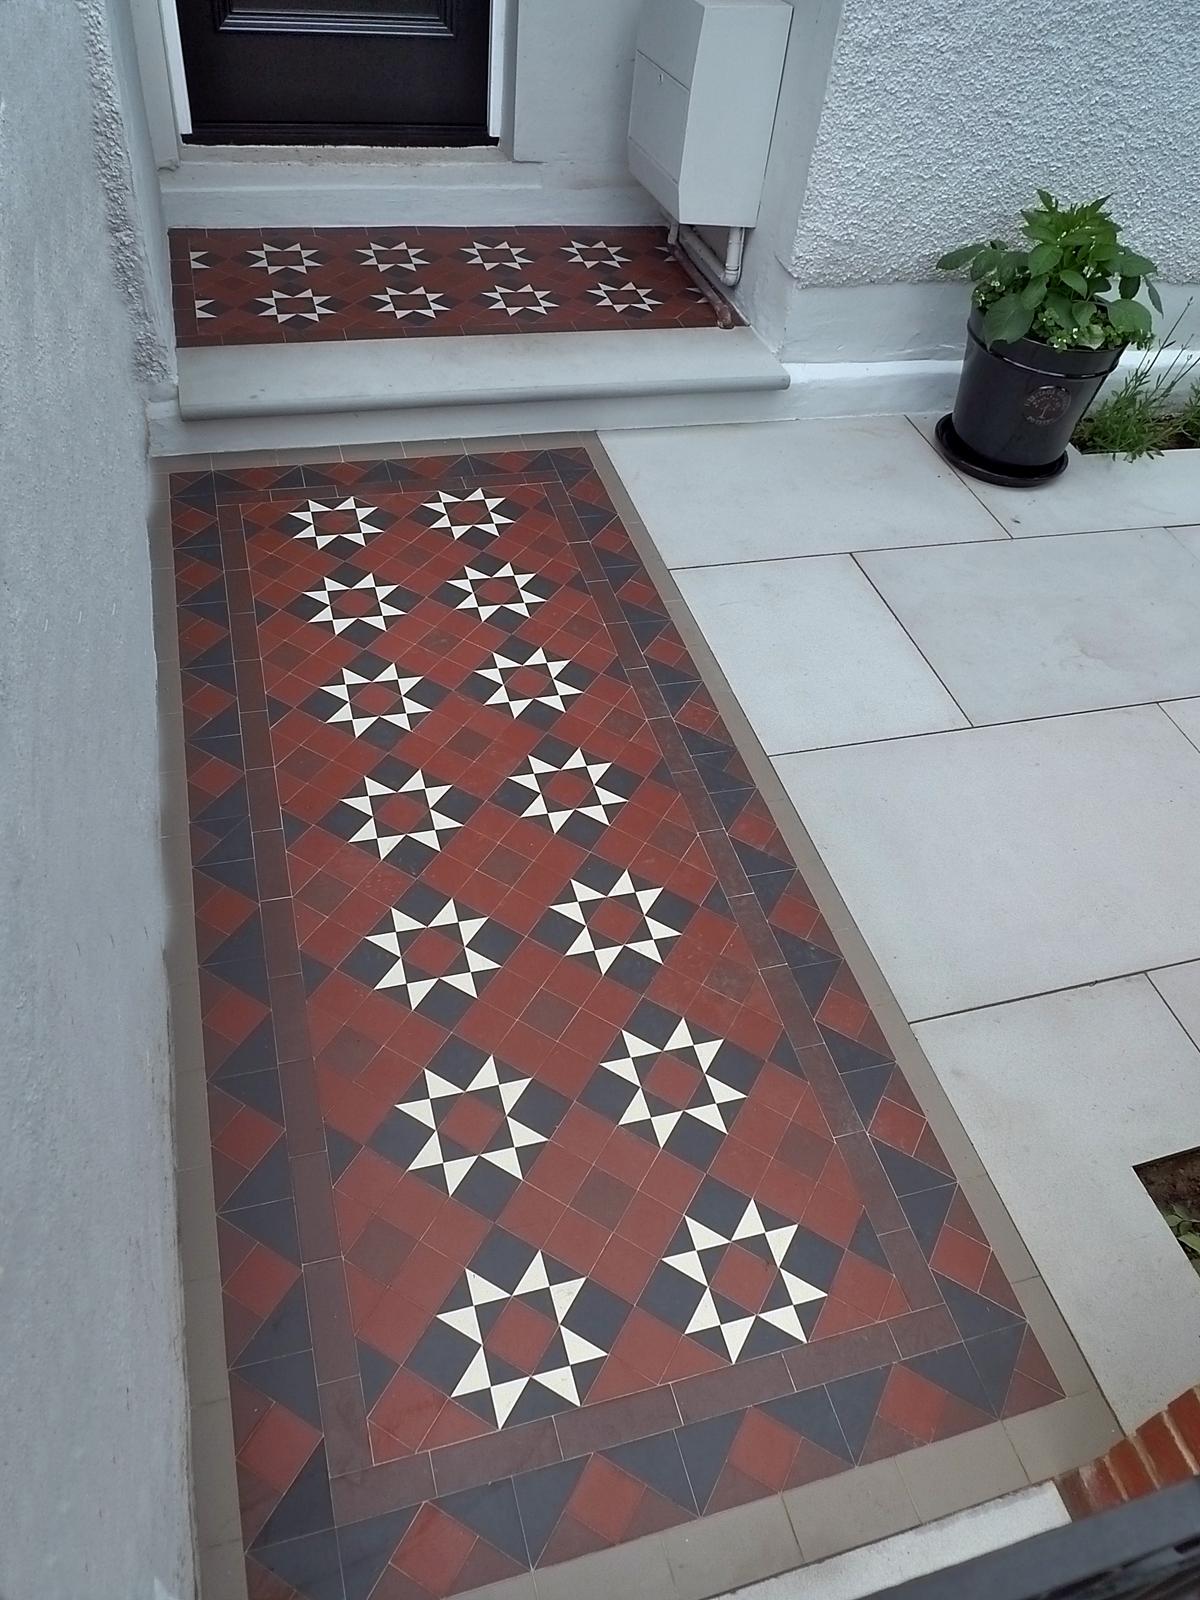 victorian mosaic tile path kennington sloane square knightsbridge mayfair victoria london